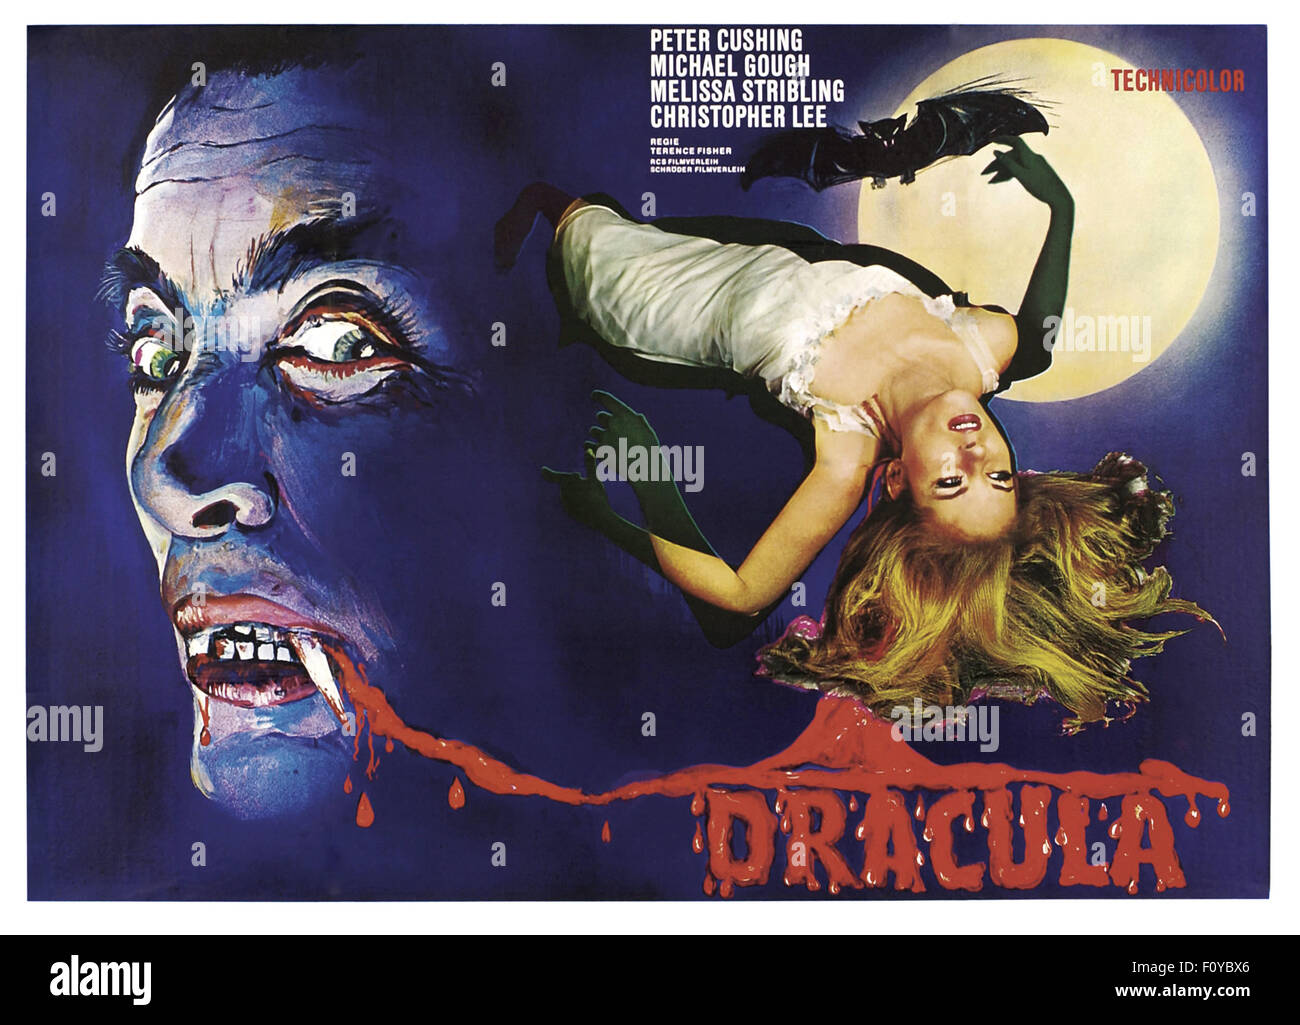 Horror of Dracula - 20 - Movie Poster Stock Photo